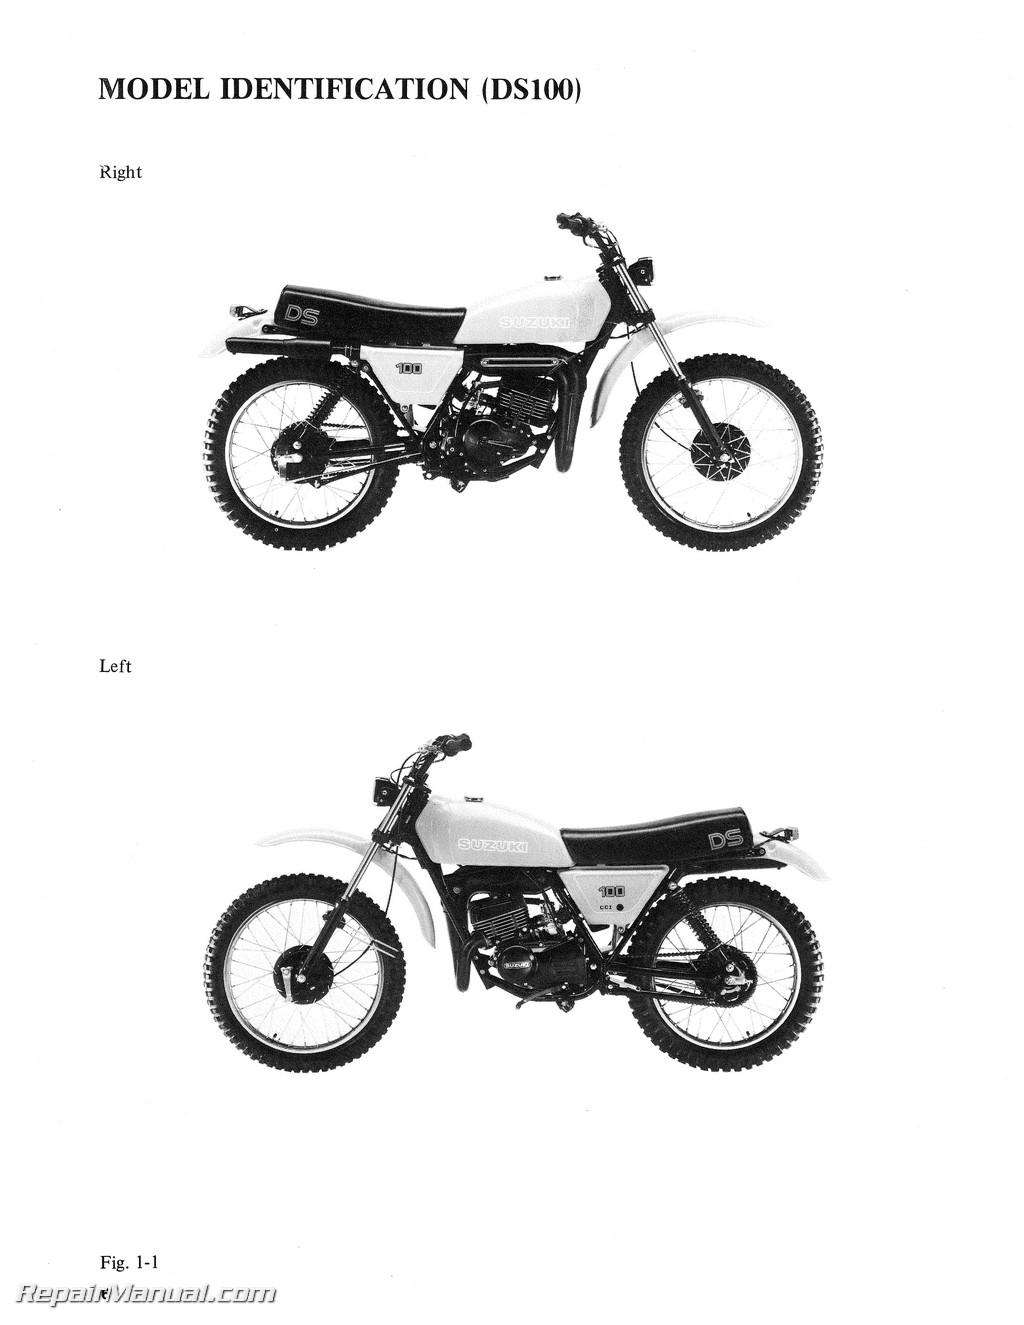 Suzuki Ds 125 Manual Ts Wiring Diagram 1978 1981 Ds100 Ds125 Motorcycle Service Rh Repairmanual Com